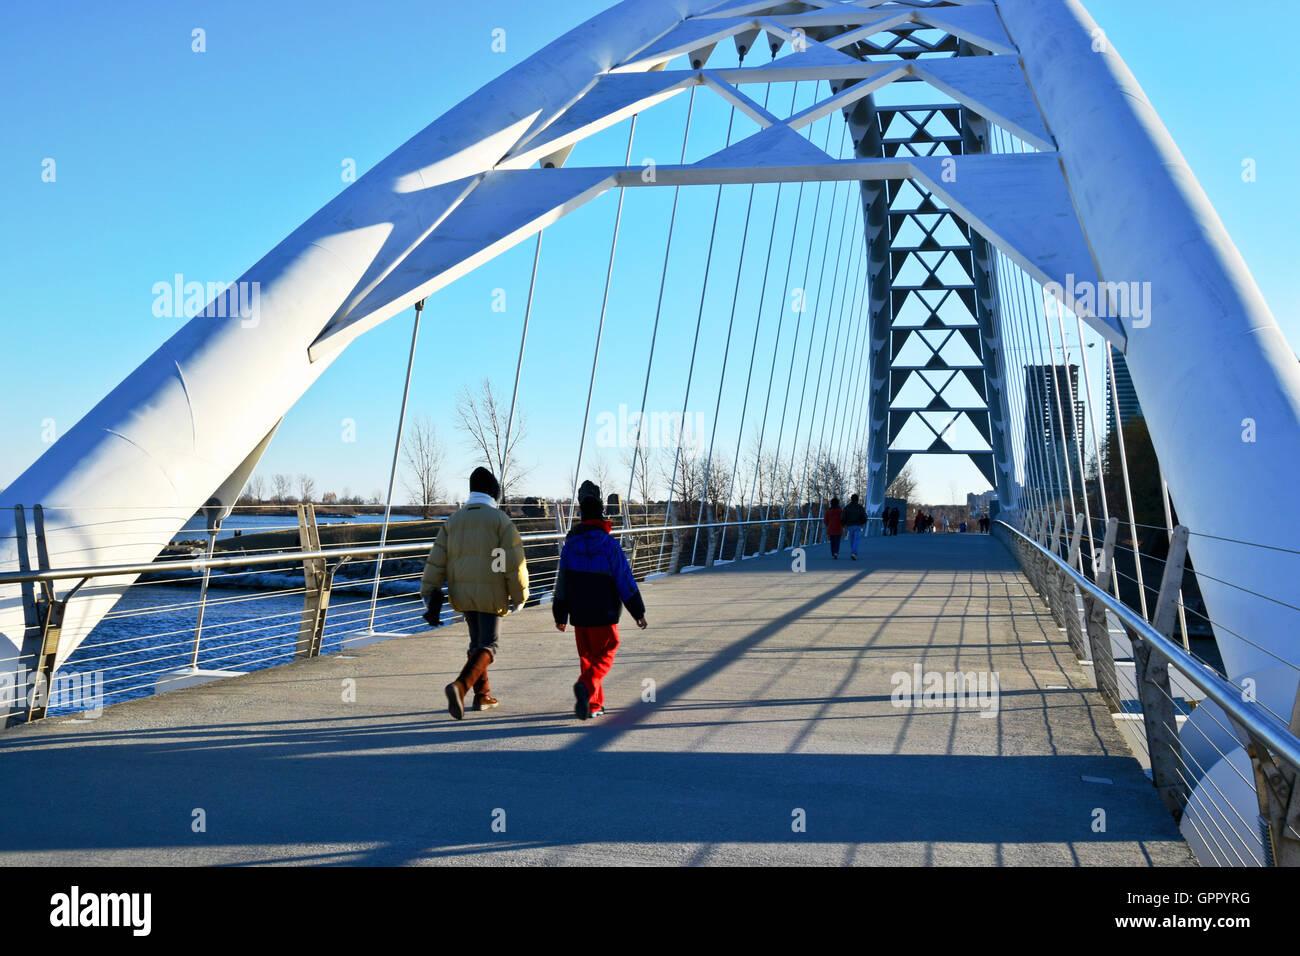 Pedestrian bridge. - Stock Image